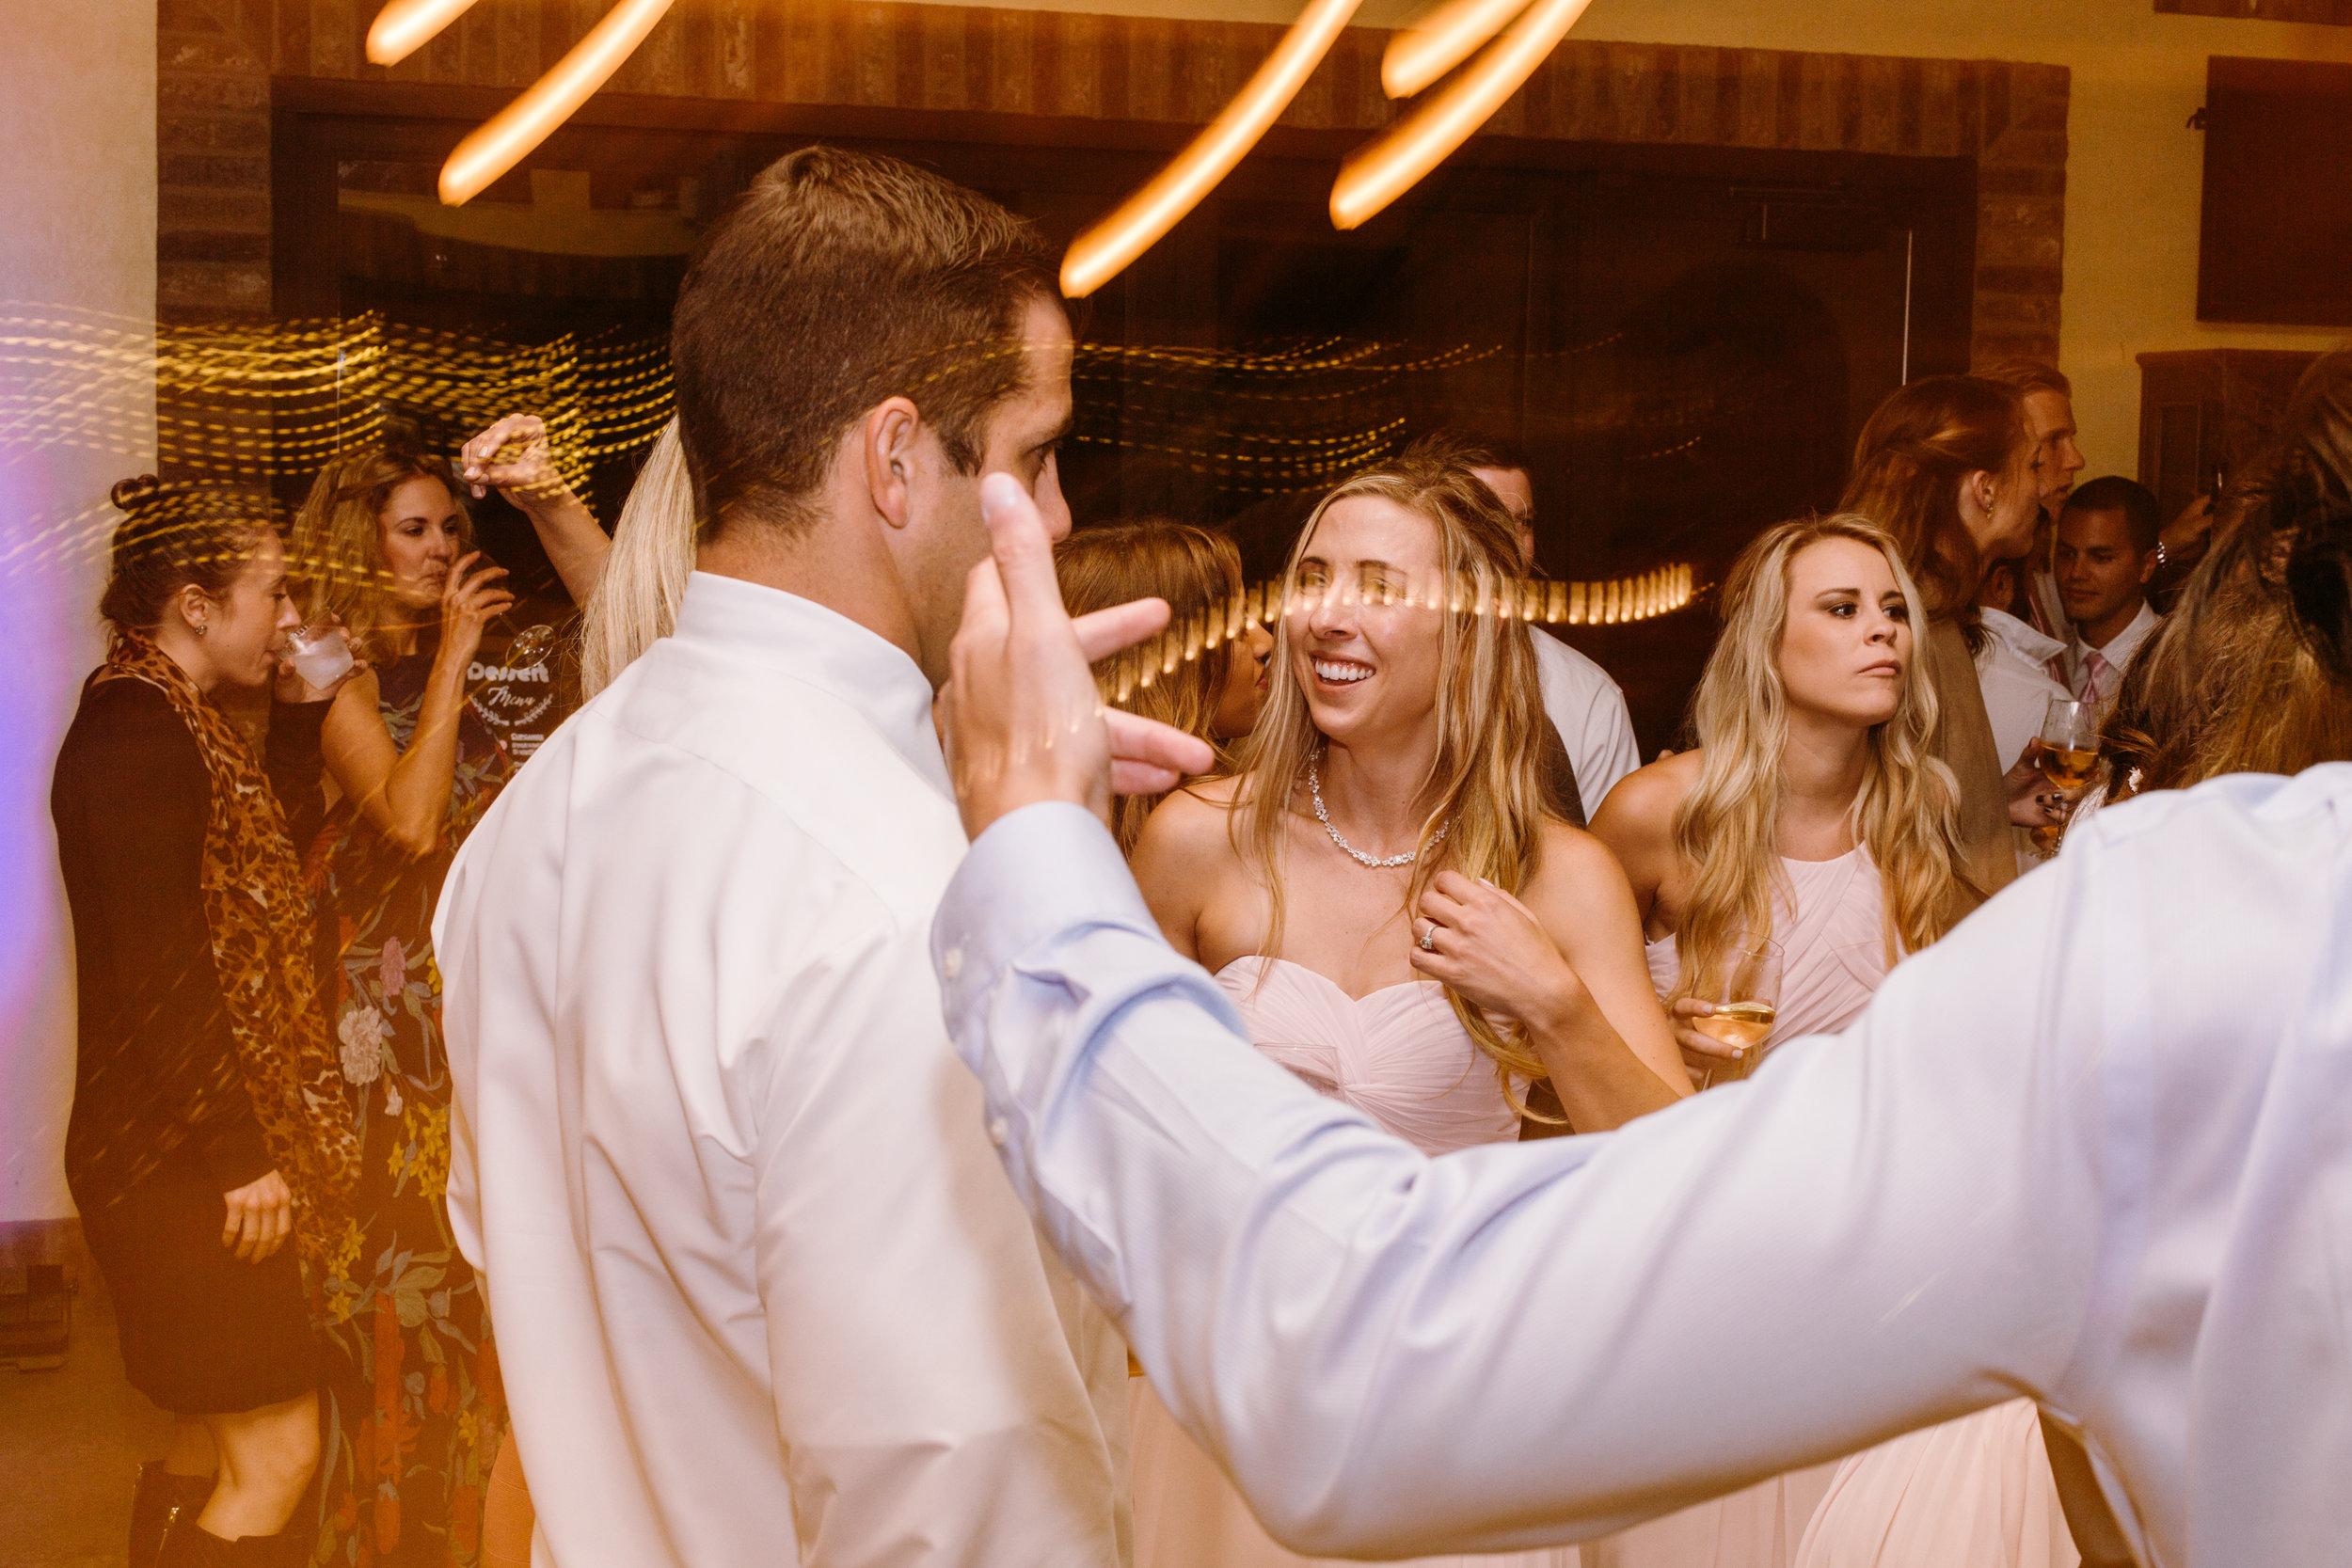 KaraNixonWeddings-LakeOakMeadows-Temecula-Wedding-49.jpg